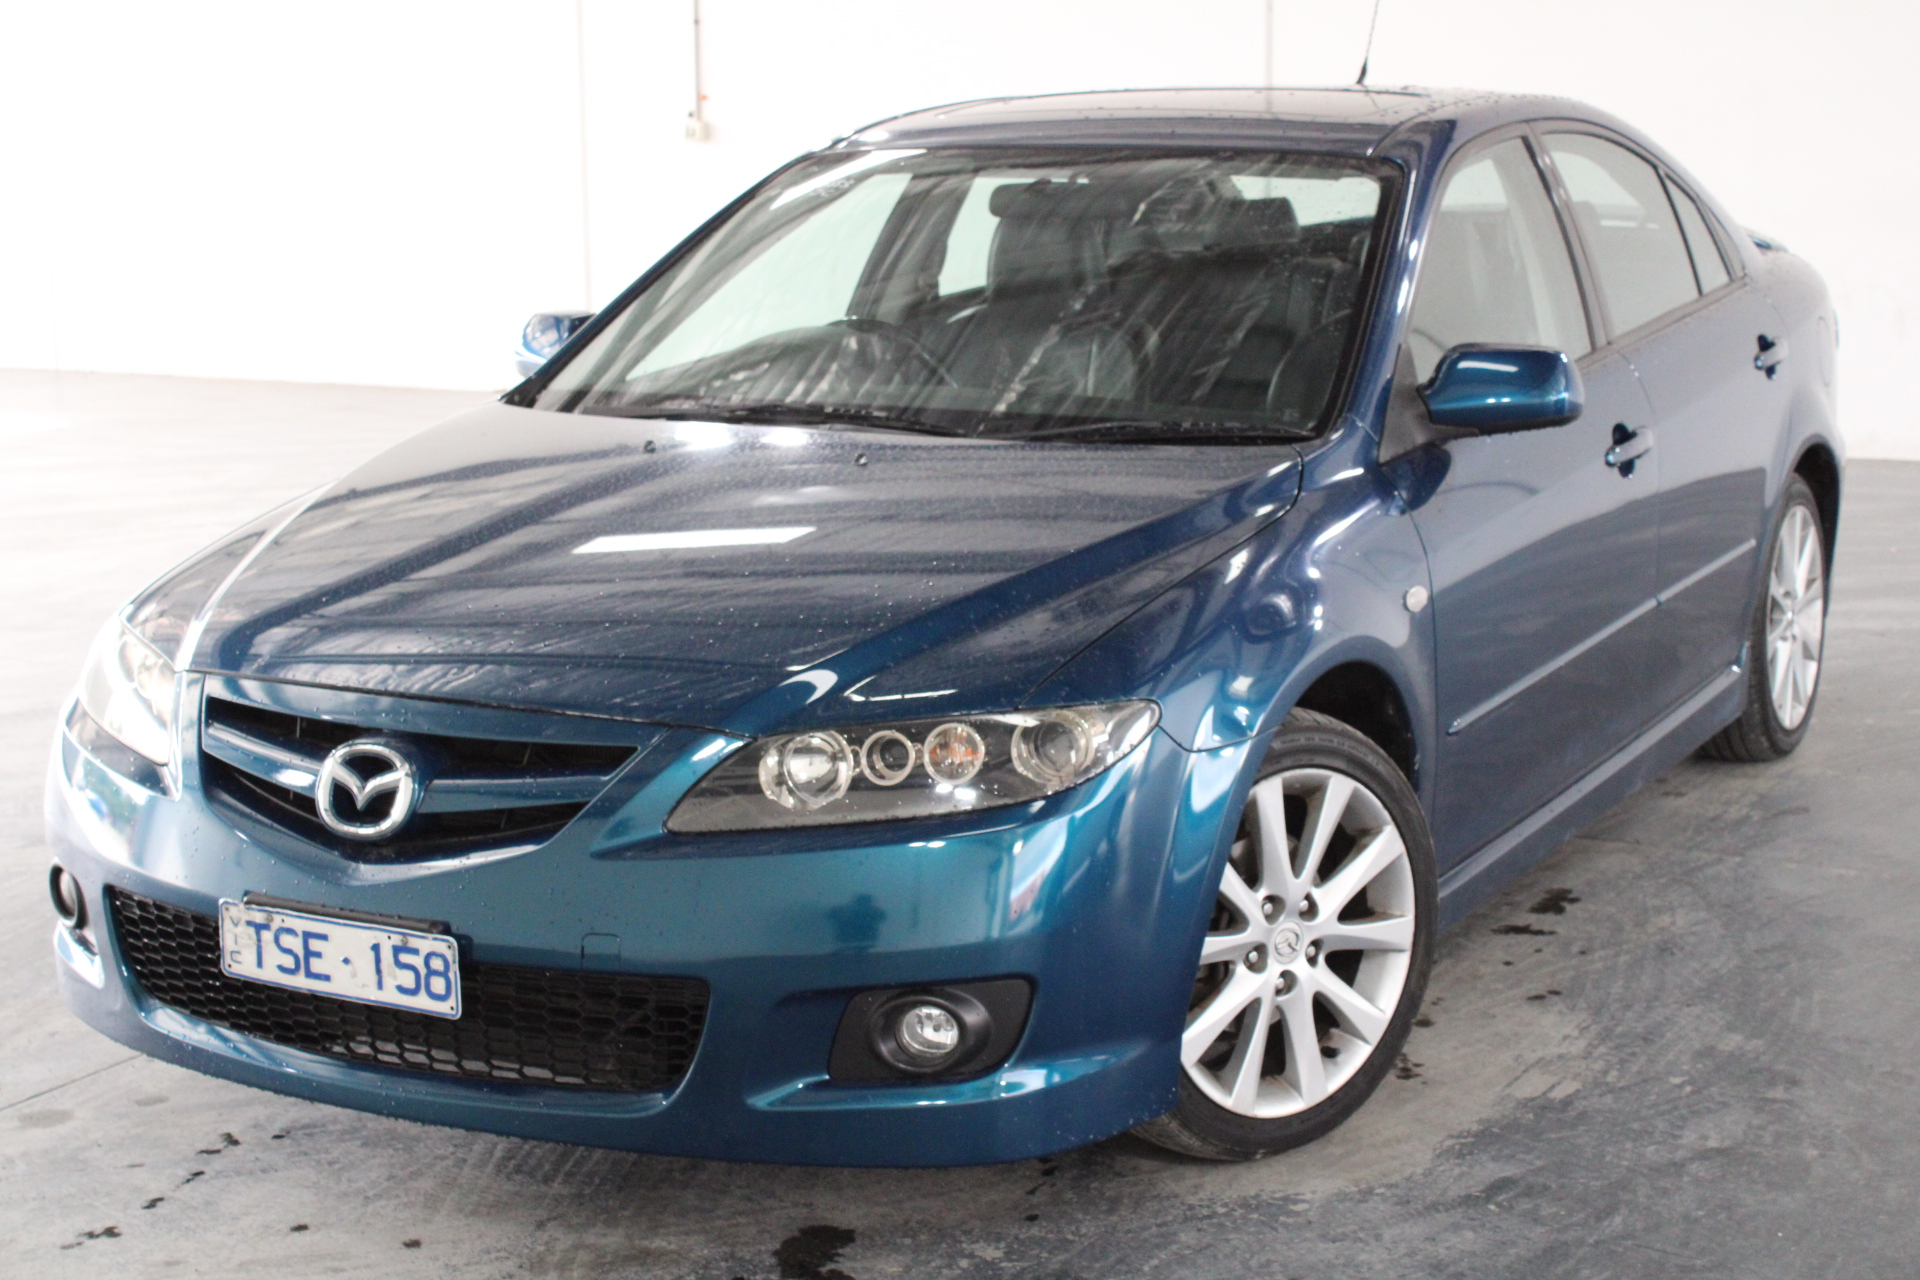 2005 Mazda 6 Luxury Sports GG Automatic Hatchback